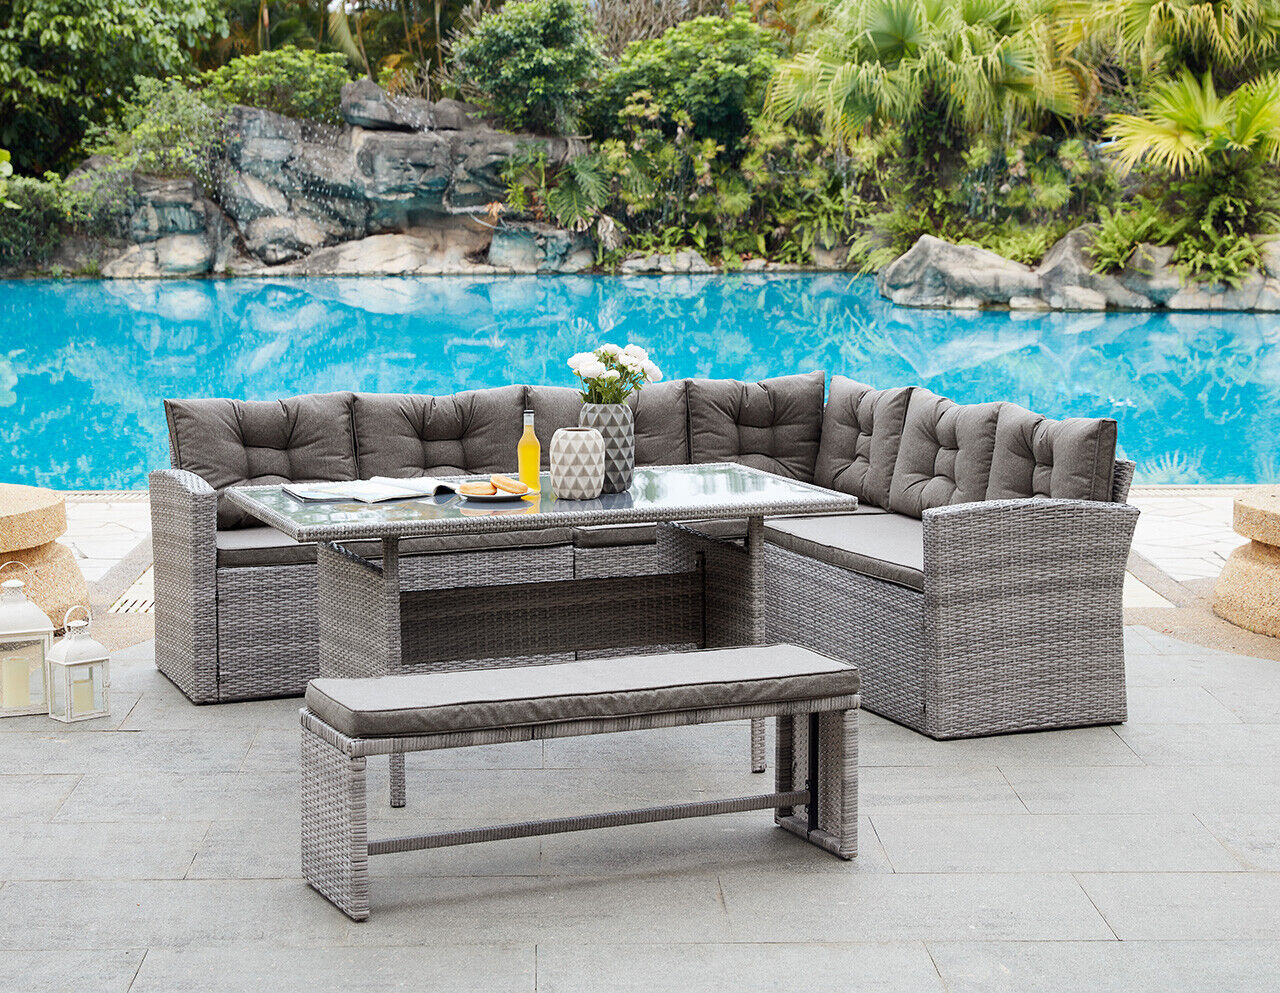 Garden Furniture - Rattan Corner Group Garden Furniture Set Outdoor Dining Sofa Set Table & Bench